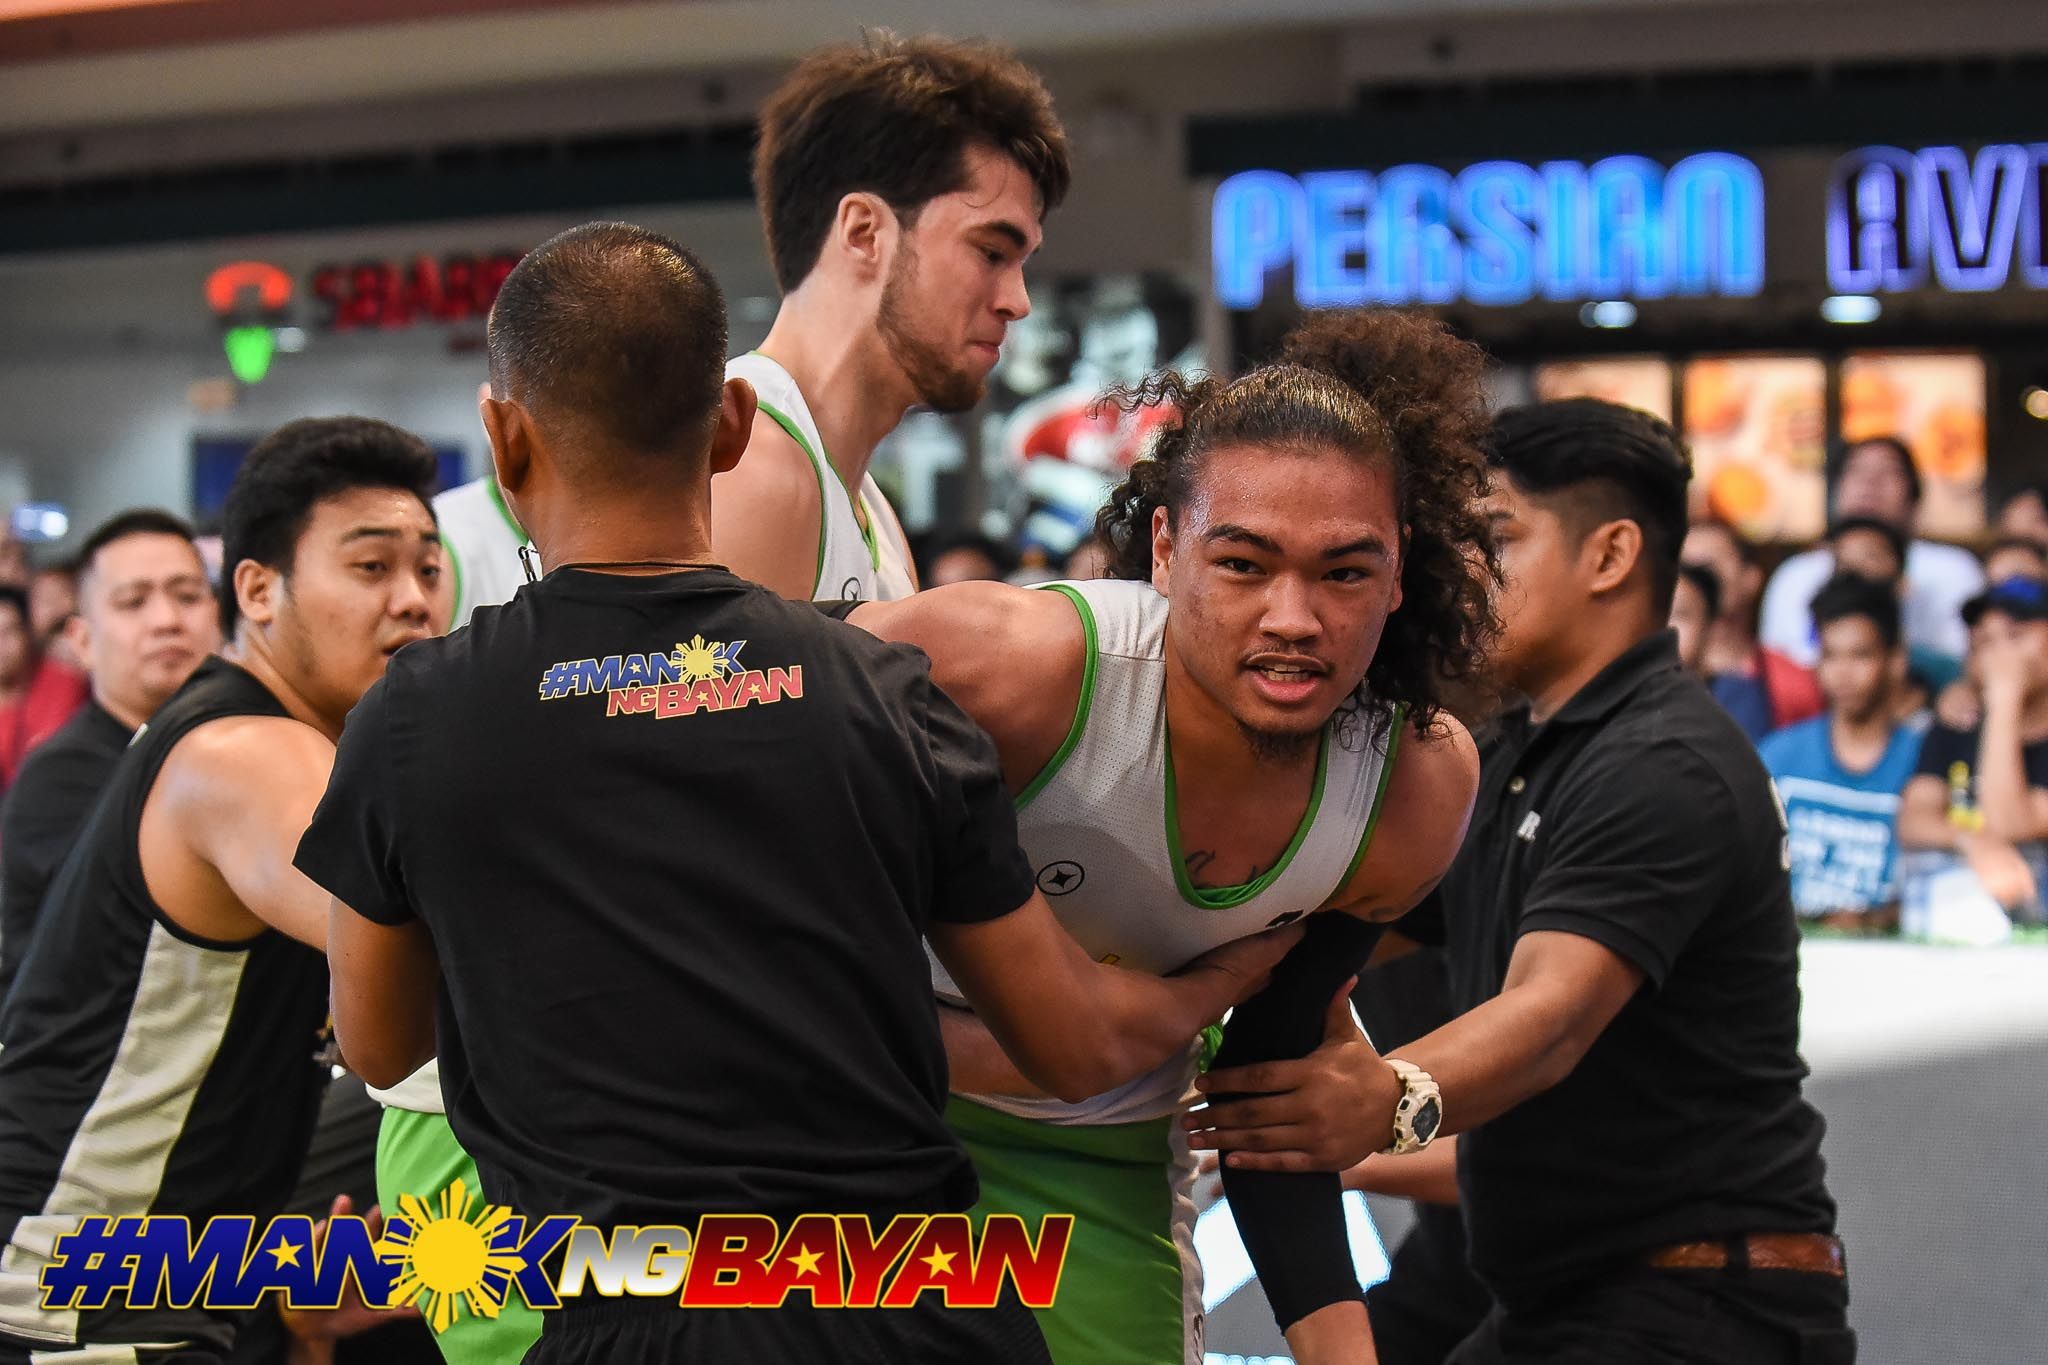 Chooks-3x3-Pasig-vs.-Bataan-Munzon-1981 Best of 2020: Munzon, Pasaol, Rike, and Santillan close Chooks 3x3's first chapter 3x3 Basketball Bandwagon Wire Chooks-to-Go Pilipinas 3x3  - philippine sports news